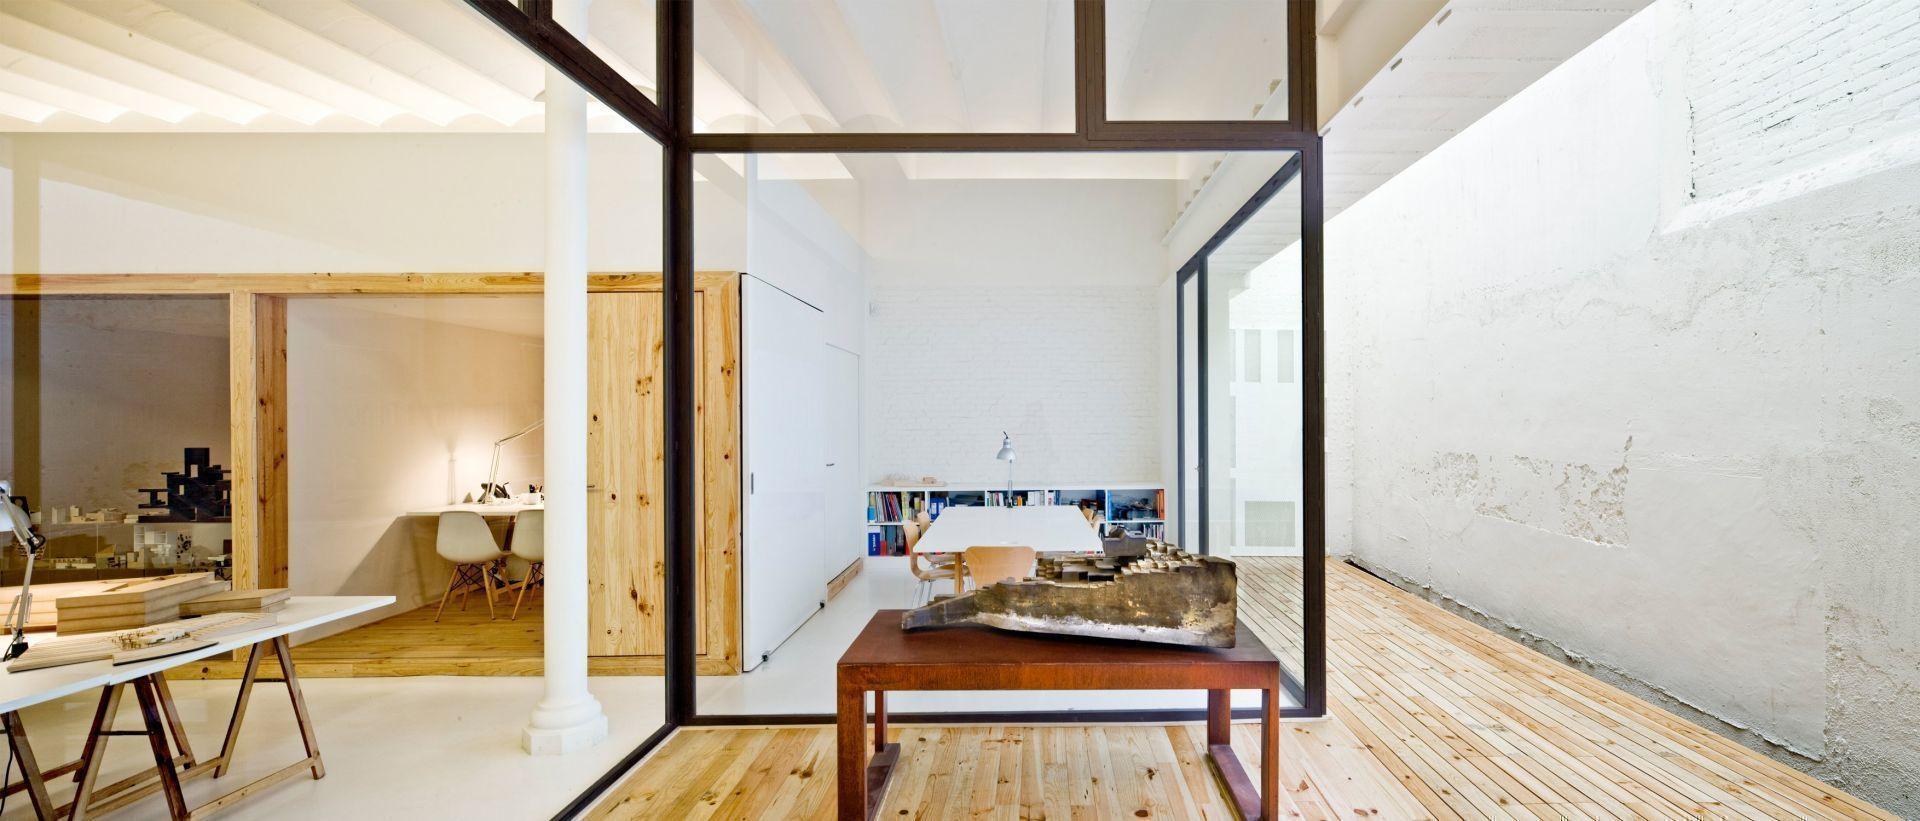 Estudio de dise o multidisciplinar en barcelona arqa - Estudio interiorismo barcelona ...